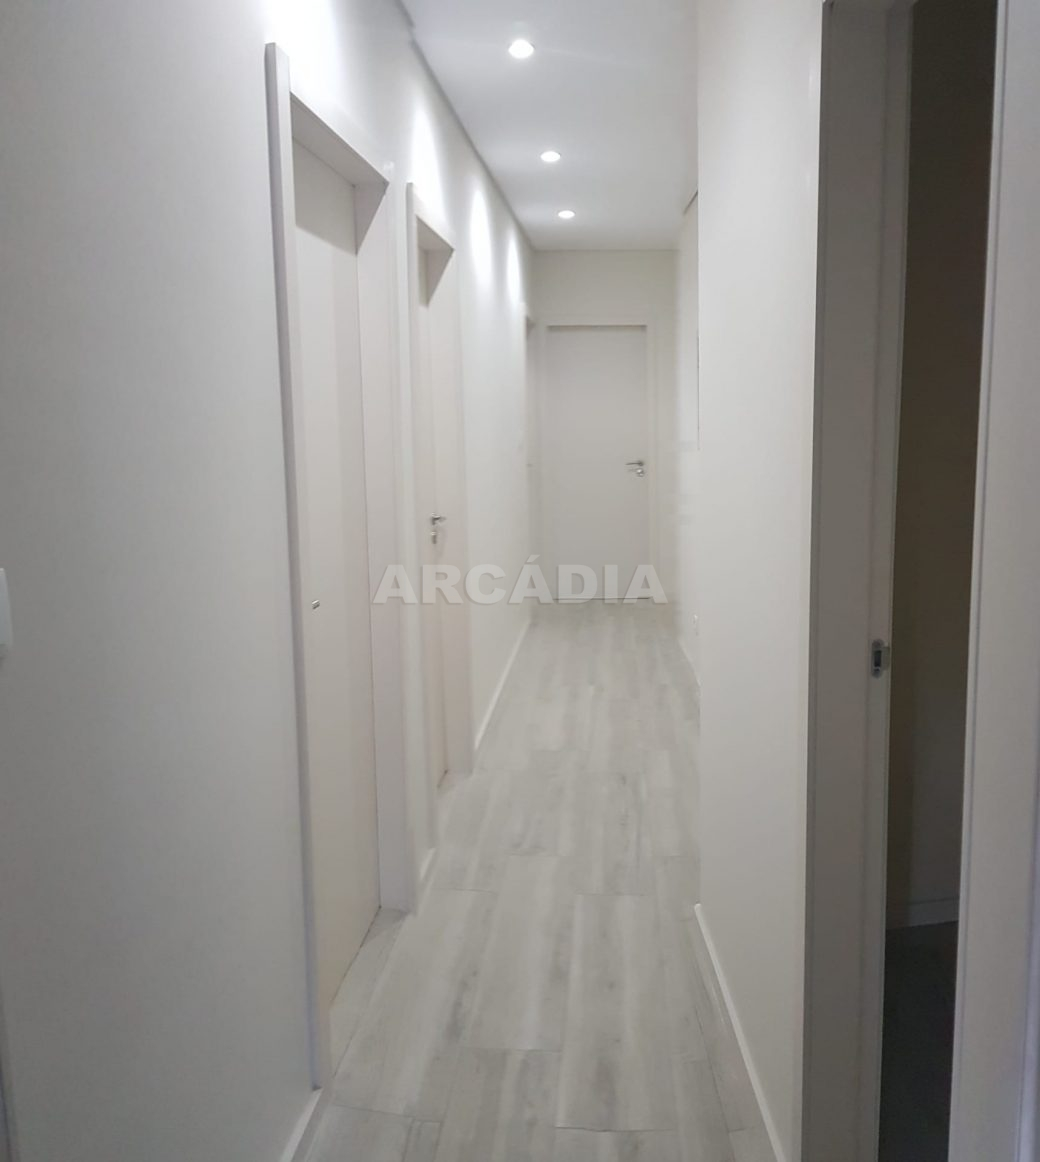 arcadia-imobiliaria-braga-apartamento-tipo-3-arrendamento-sao-lazaro-remodelado-excelente-preco-unica-oportunidade24